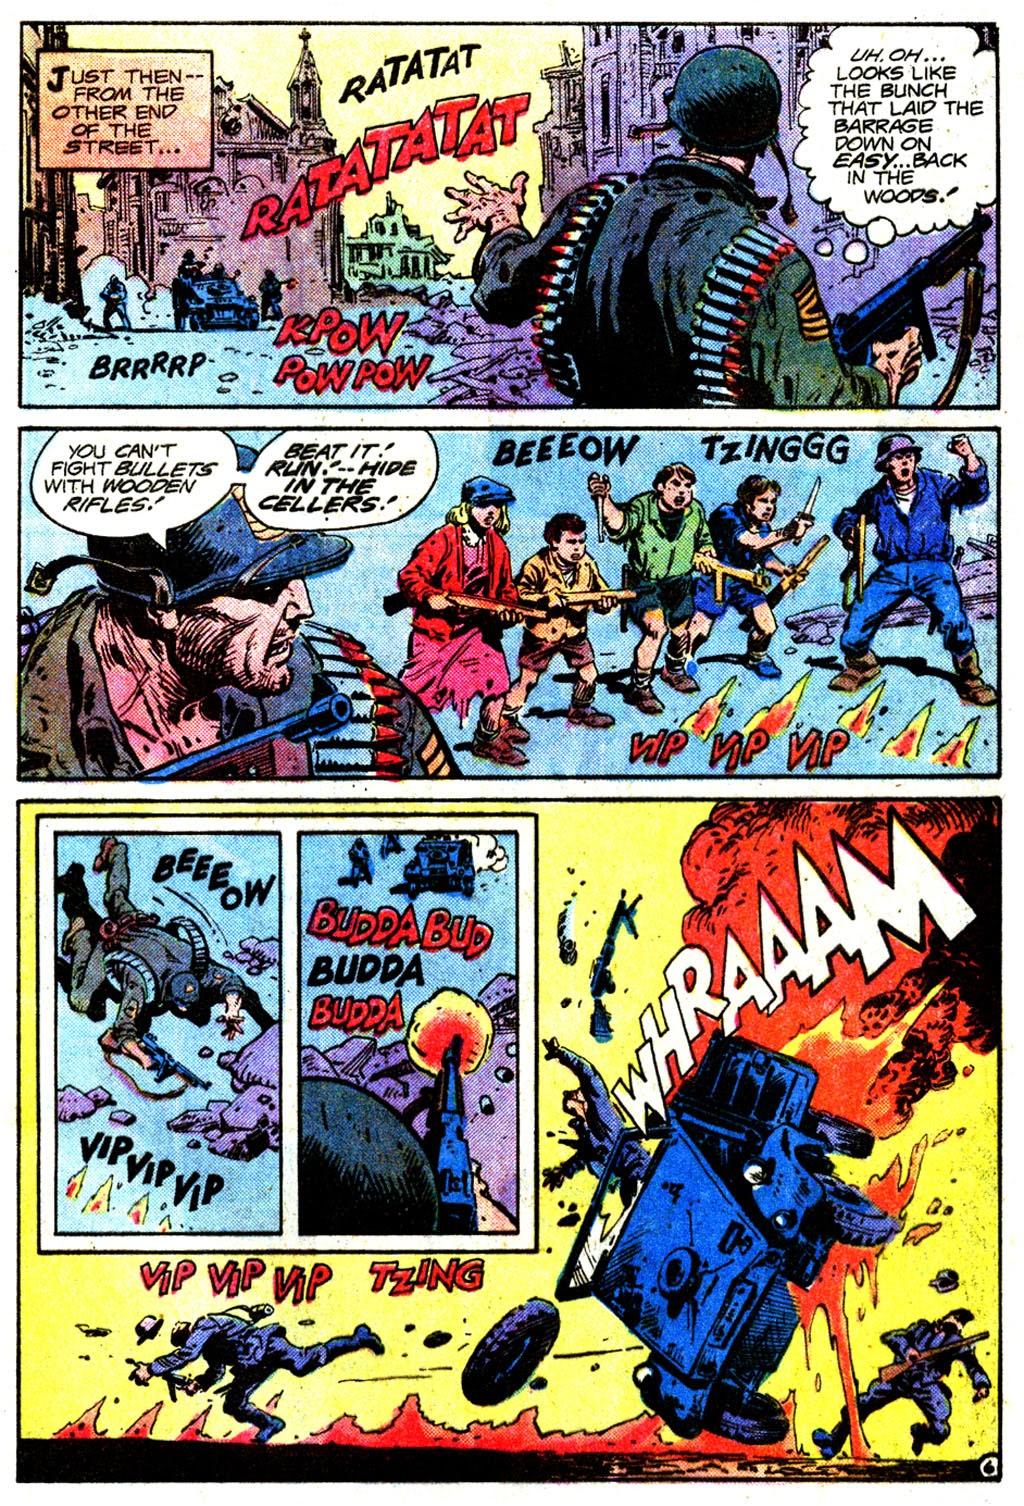 Read online Sgt. Rock comic -  Issue #358 - 6